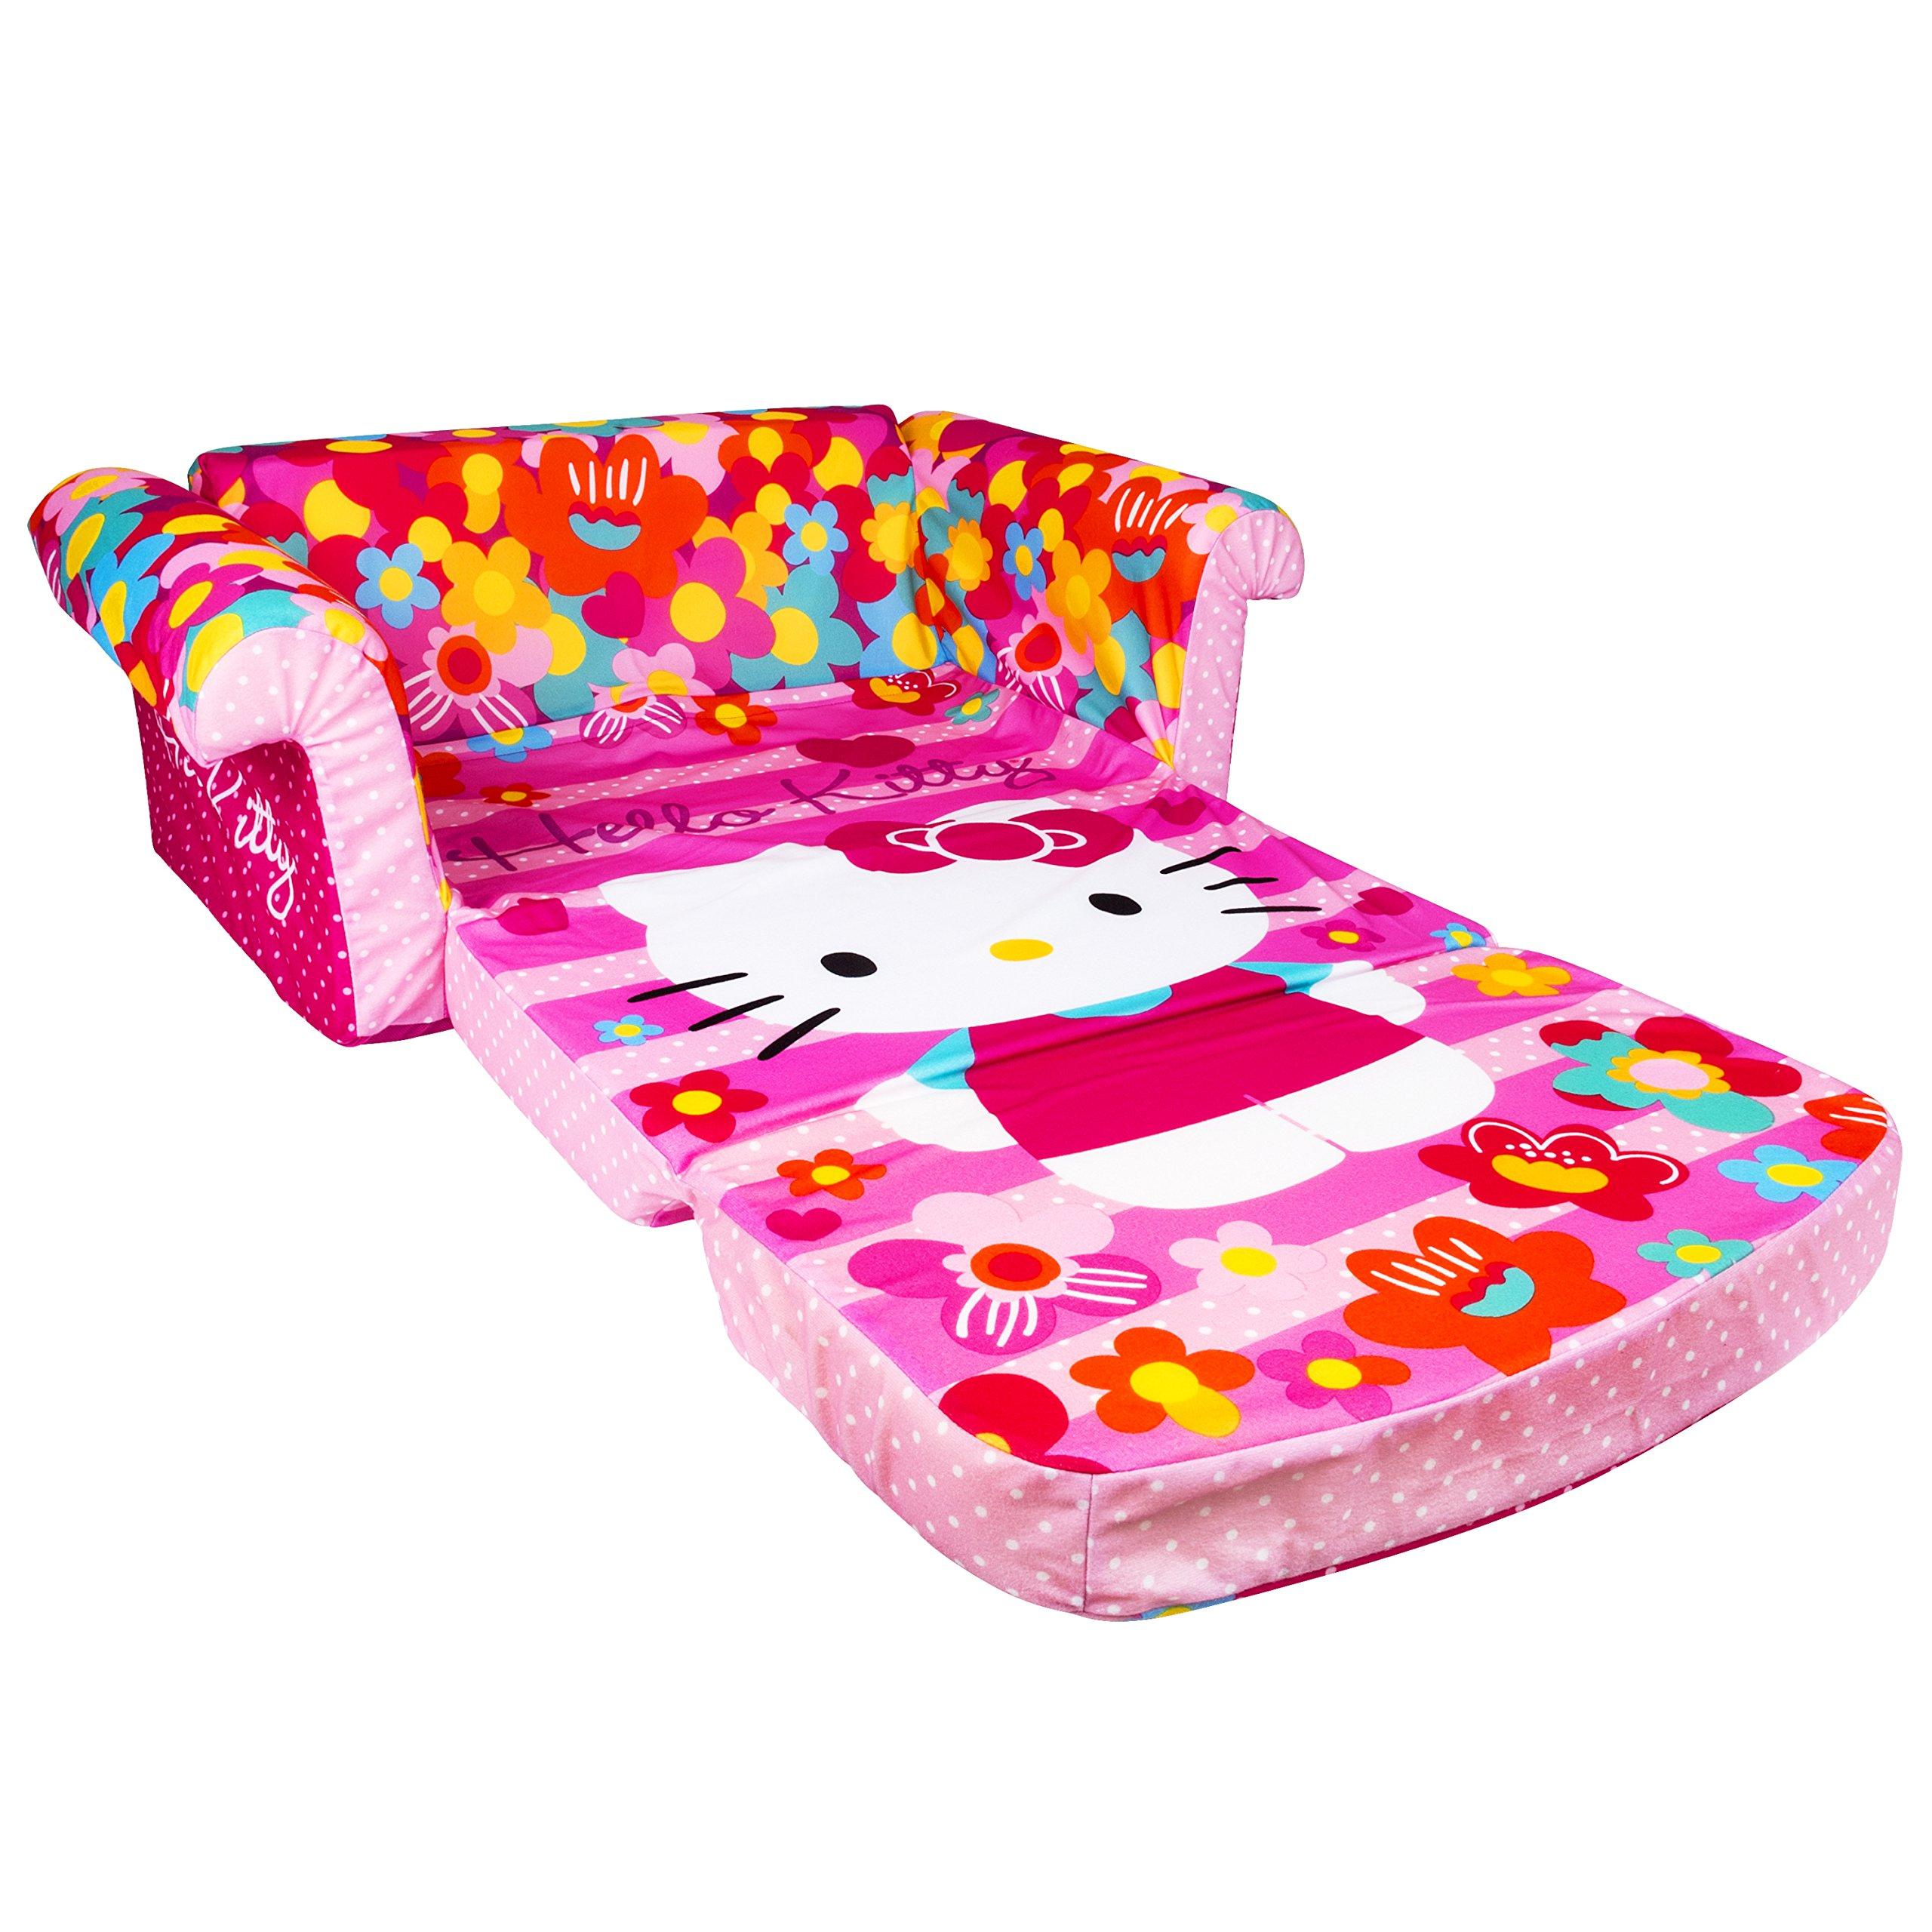 Marshmallow Furniture Childrens 2 In 1 Flip Open Foam Sofa Hello